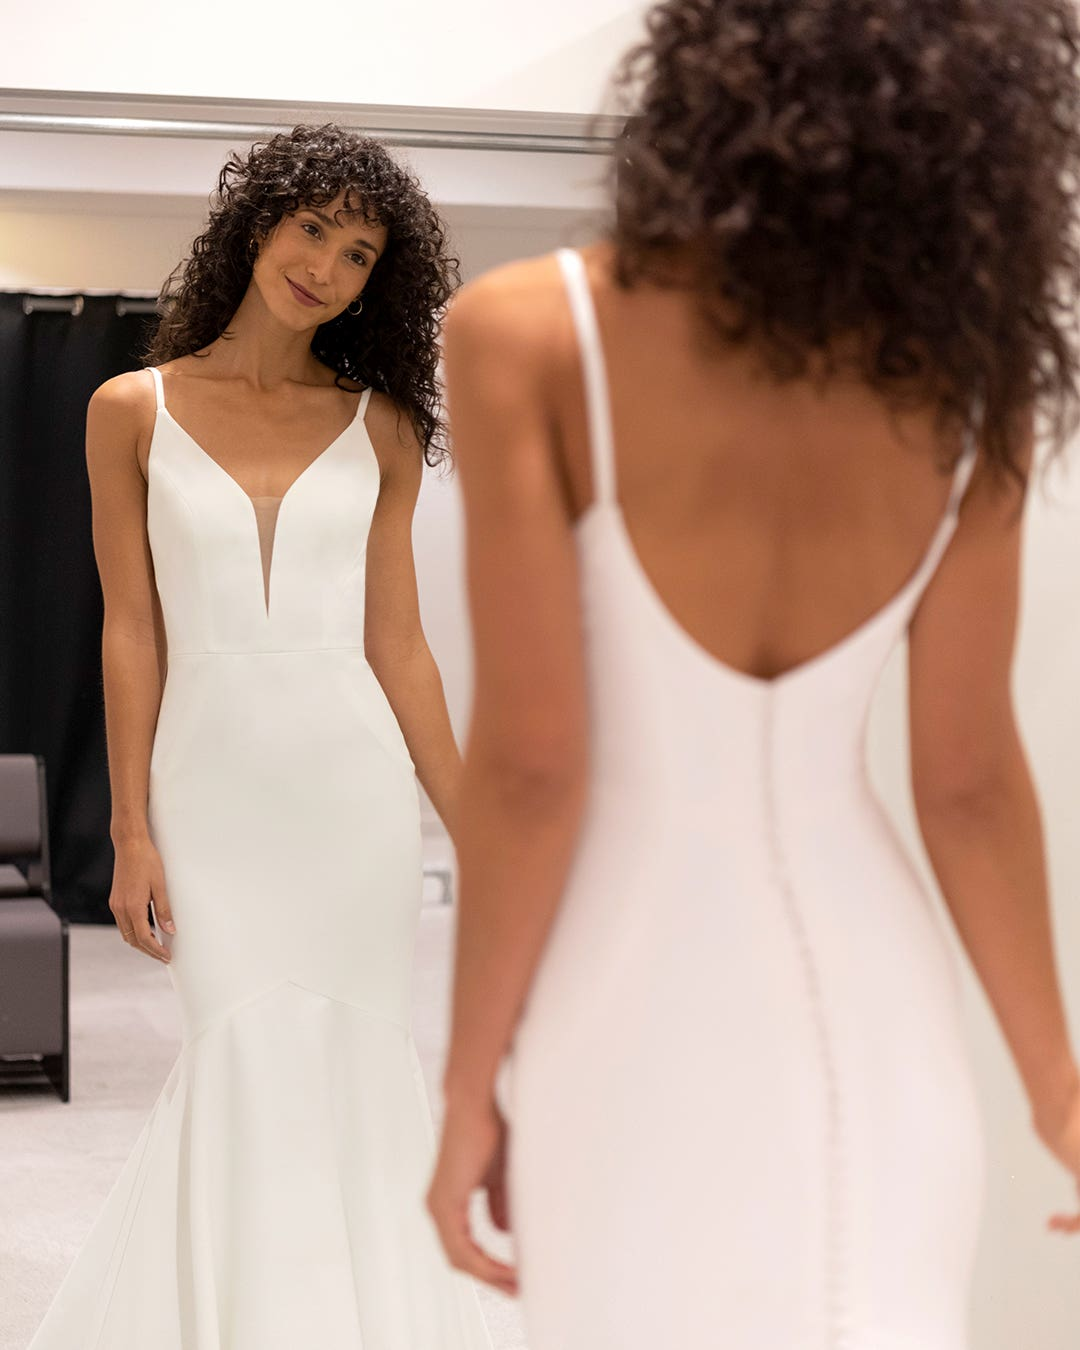 BLAISE - une robe glamour et moderne